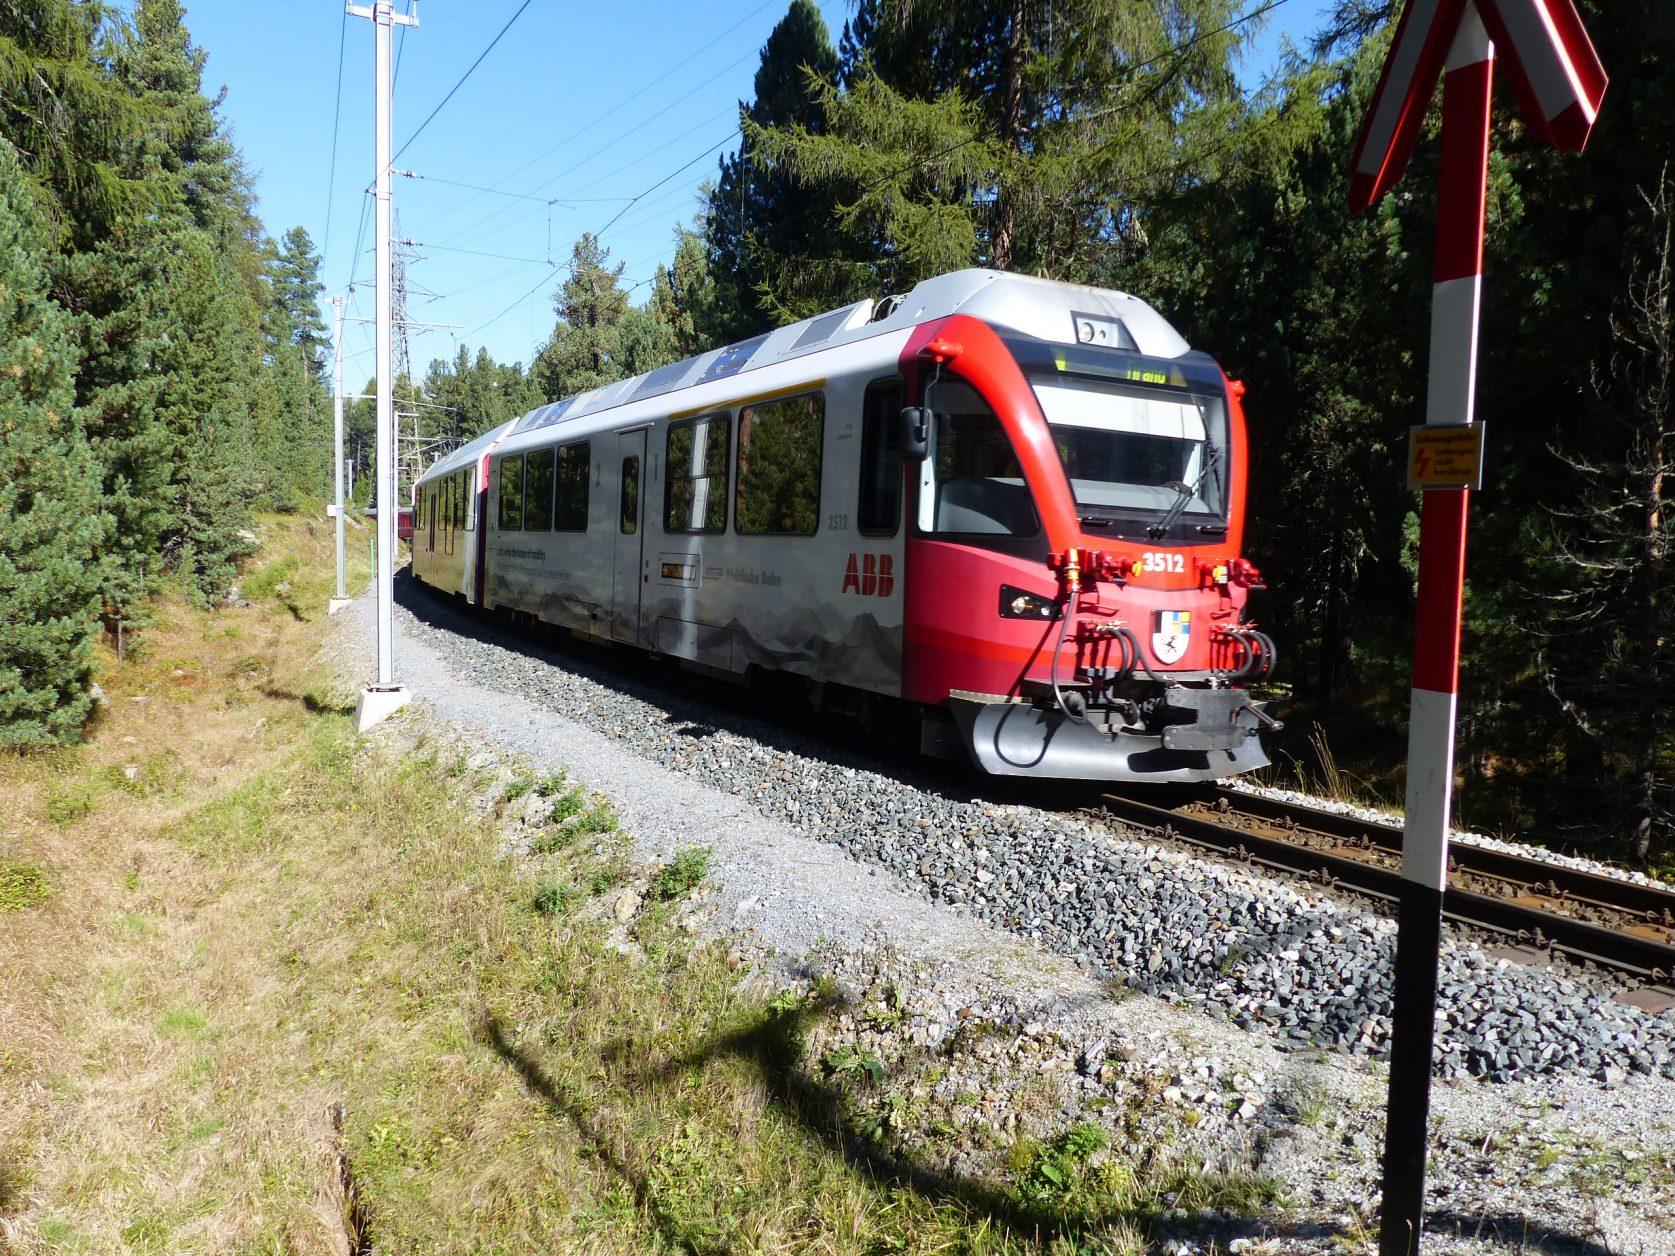 Schweiz Rätsche Bahn